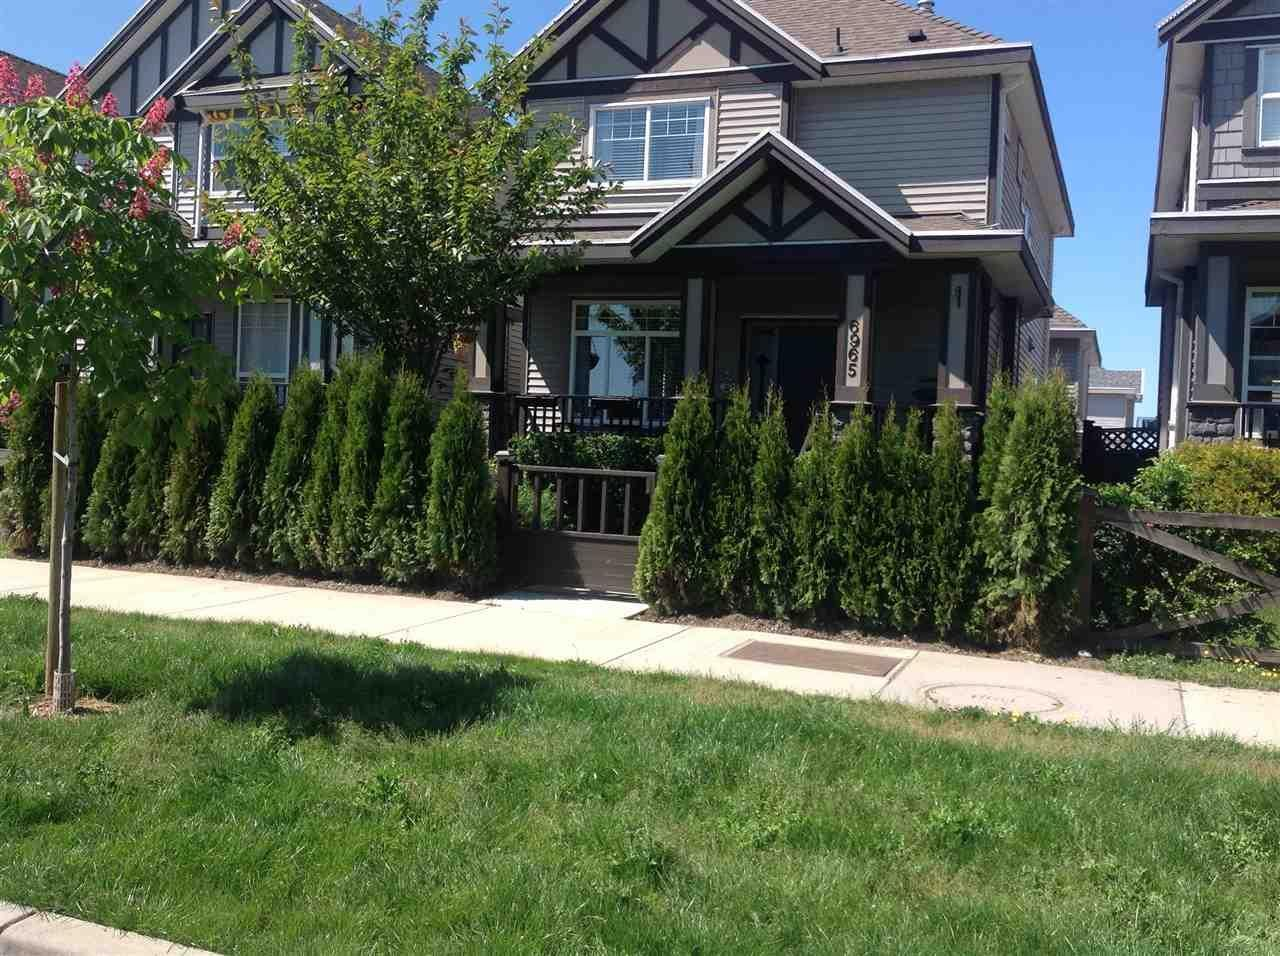 R2064091 - 6965 192 STREET, Clayton, Surrey, BC - House/Single Family